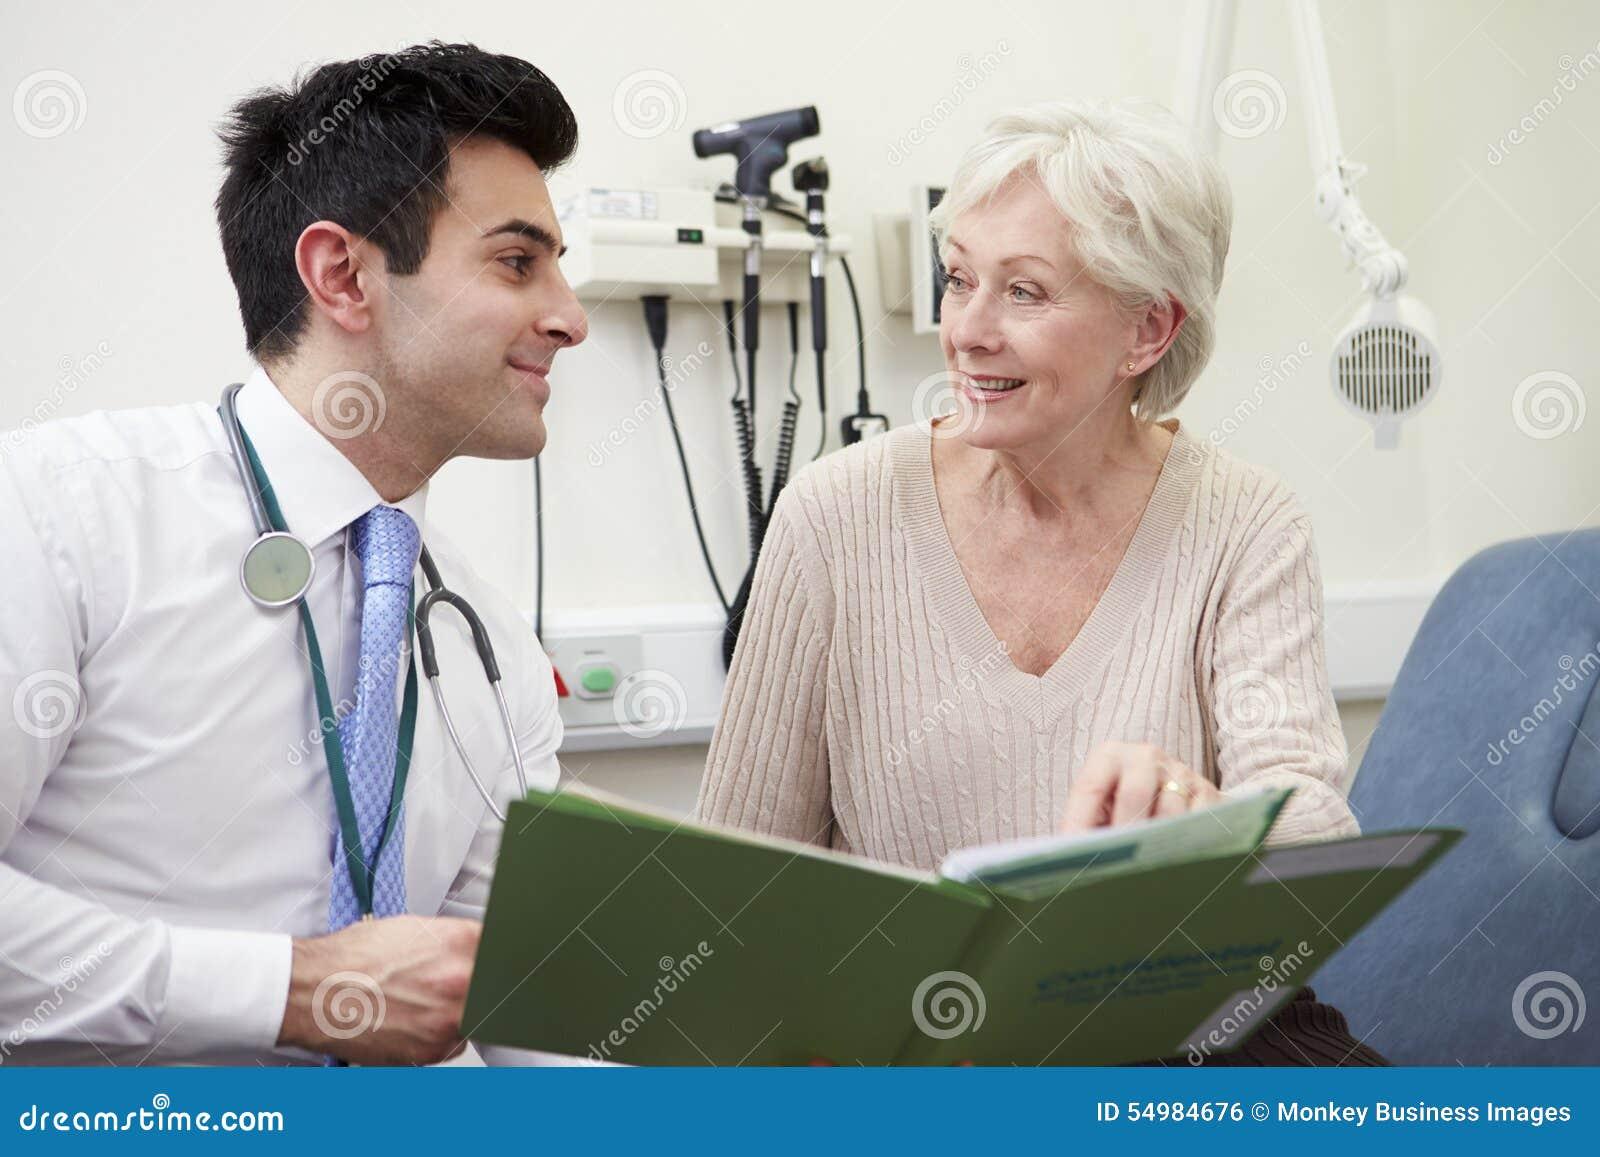 Konsulent Discussing Test Results med patienten